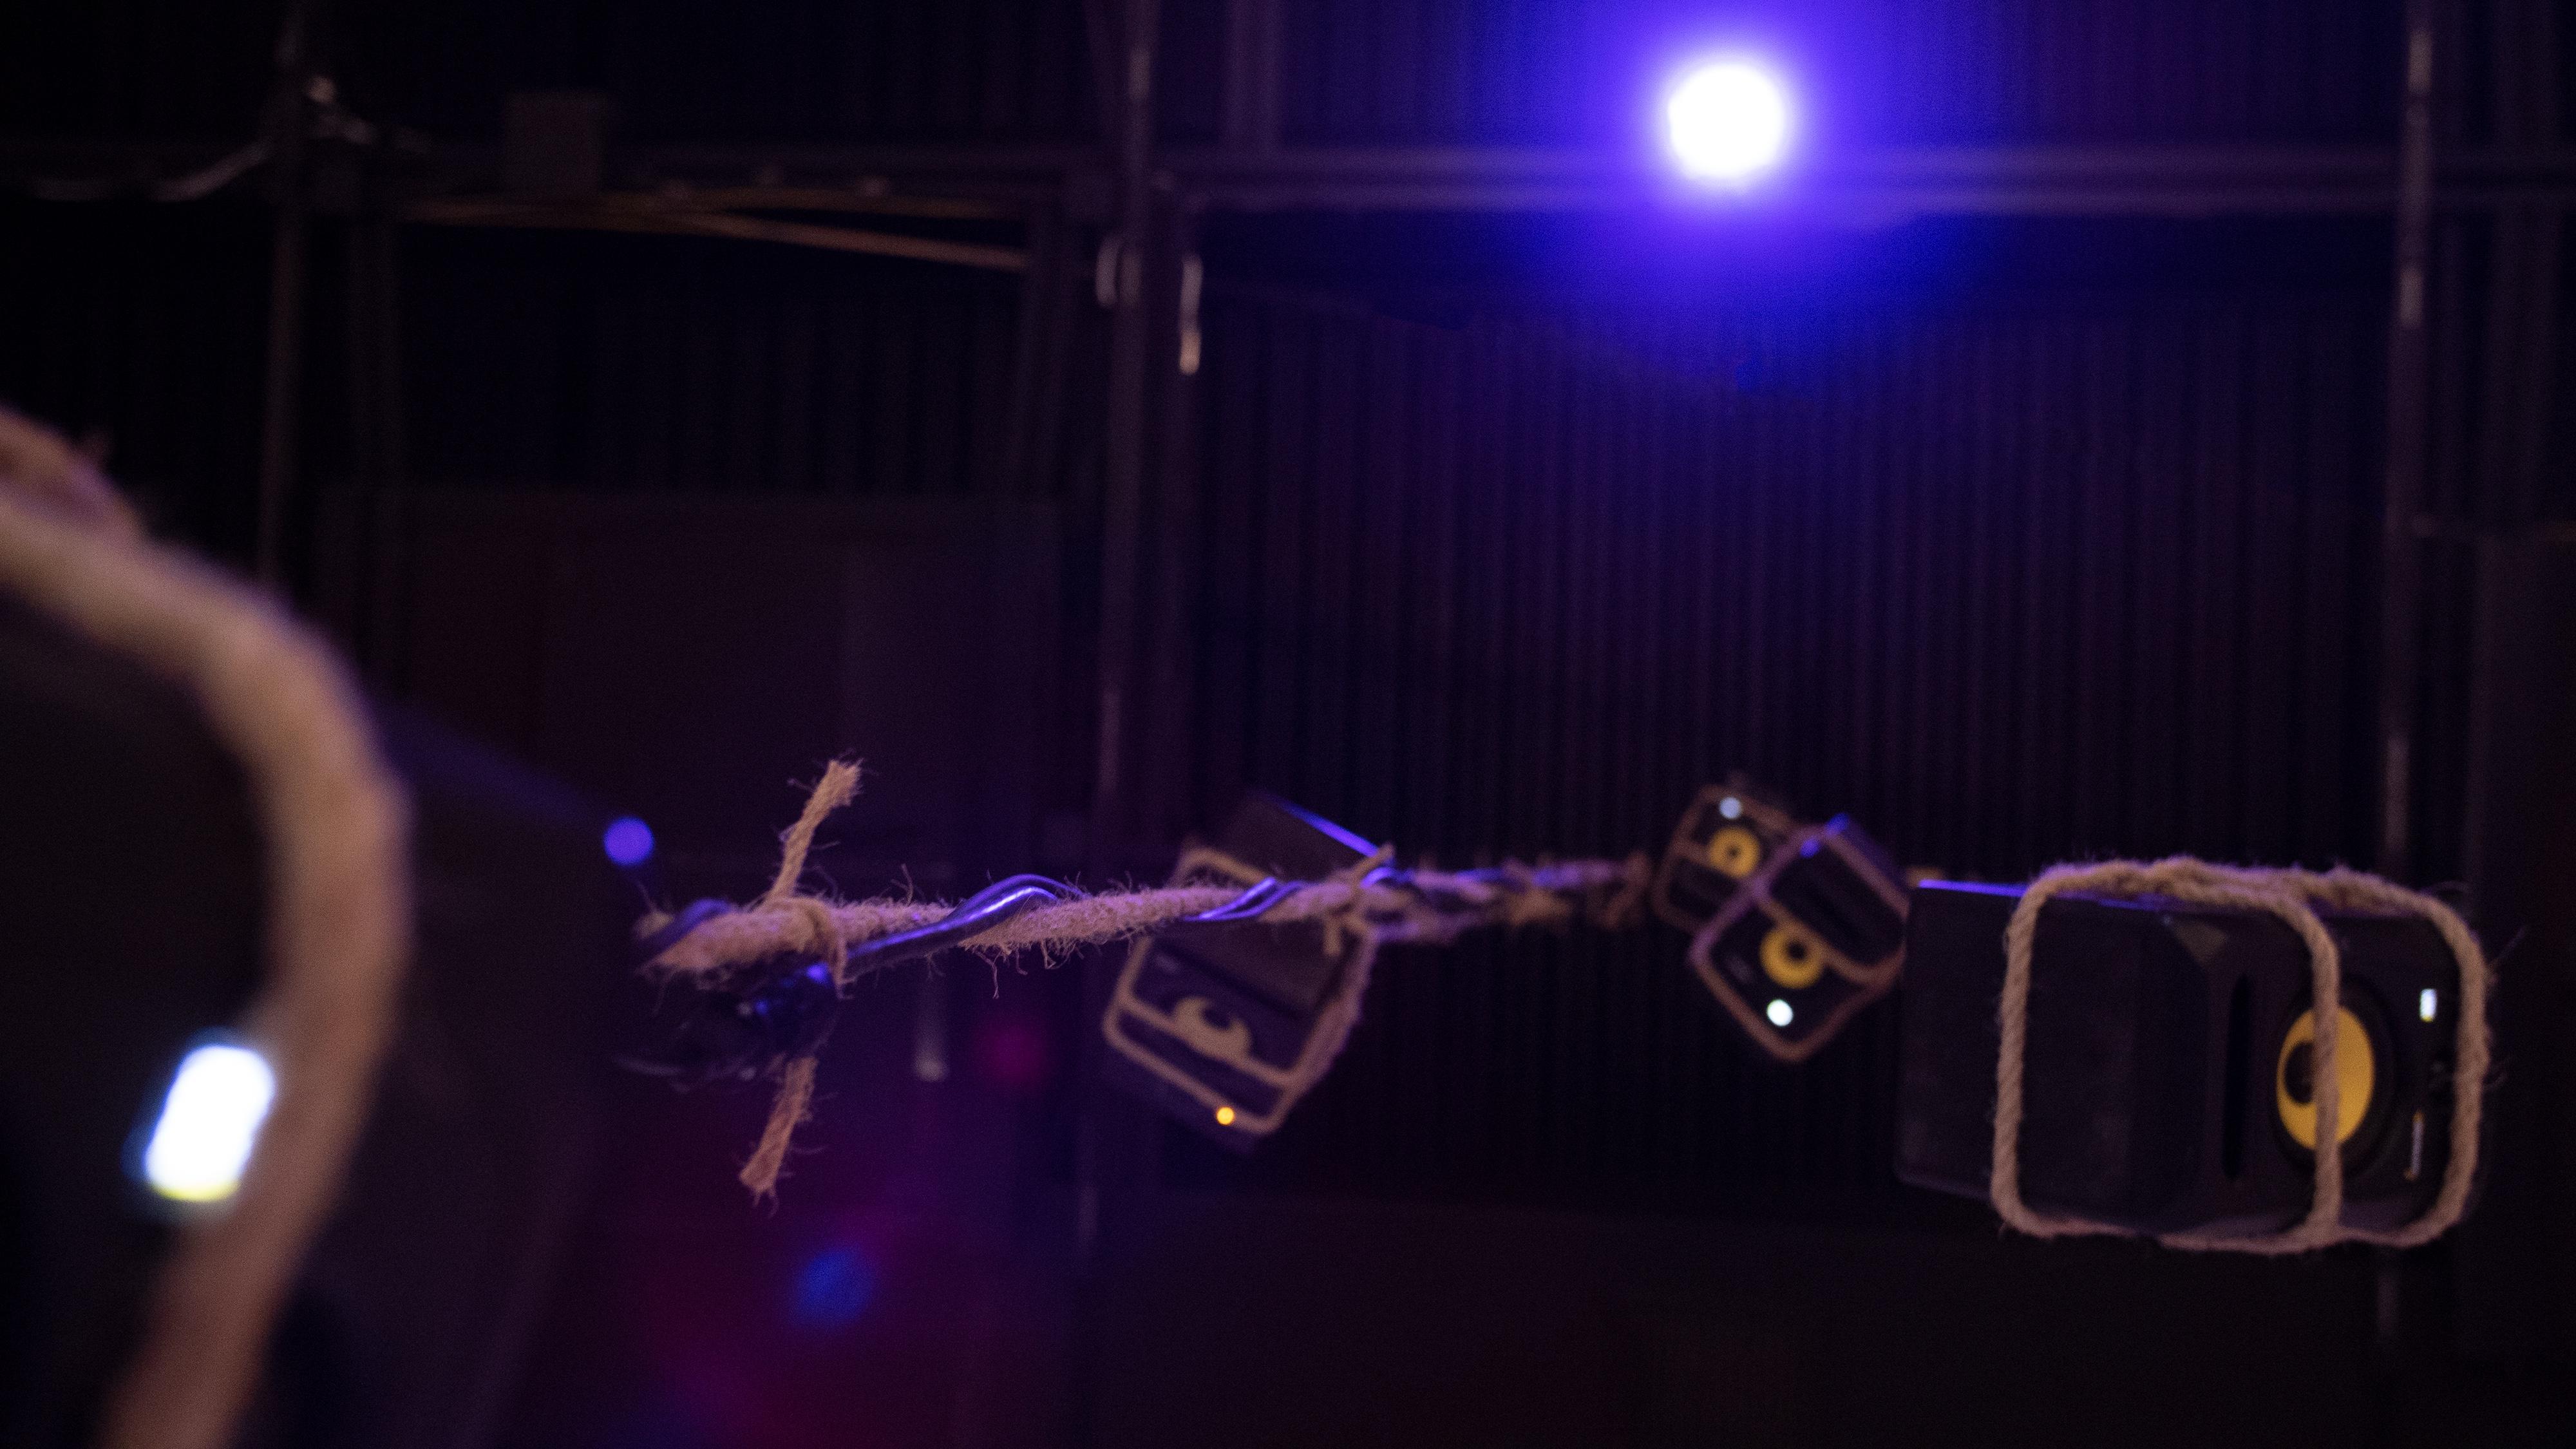 detail image of suspended speakers